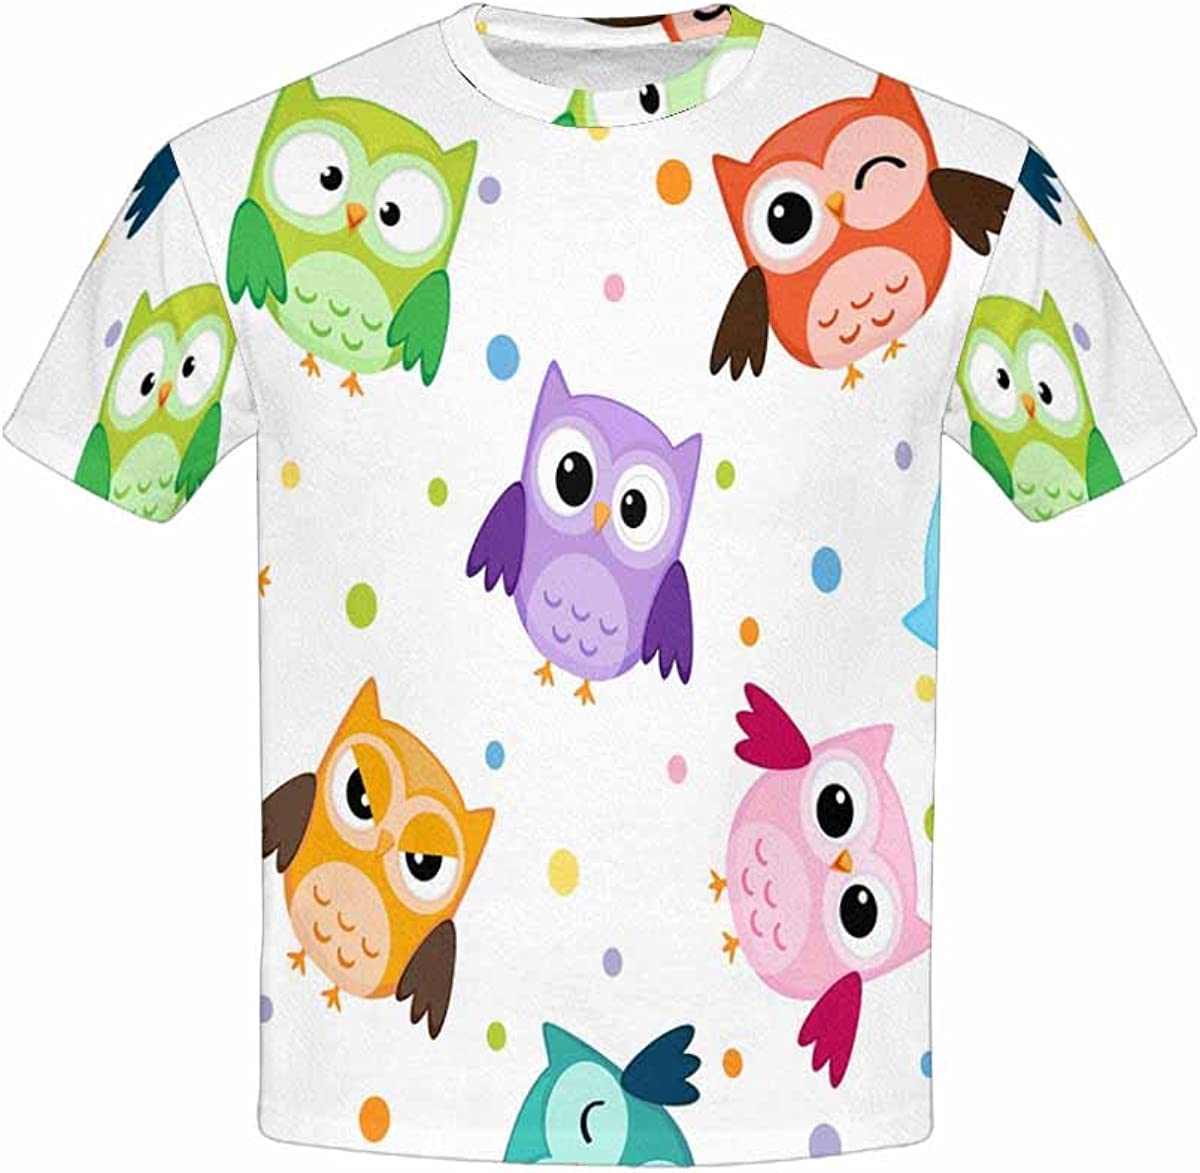 INTERESTPRINT Childs T-Shirt Colorful Owls XS-XL